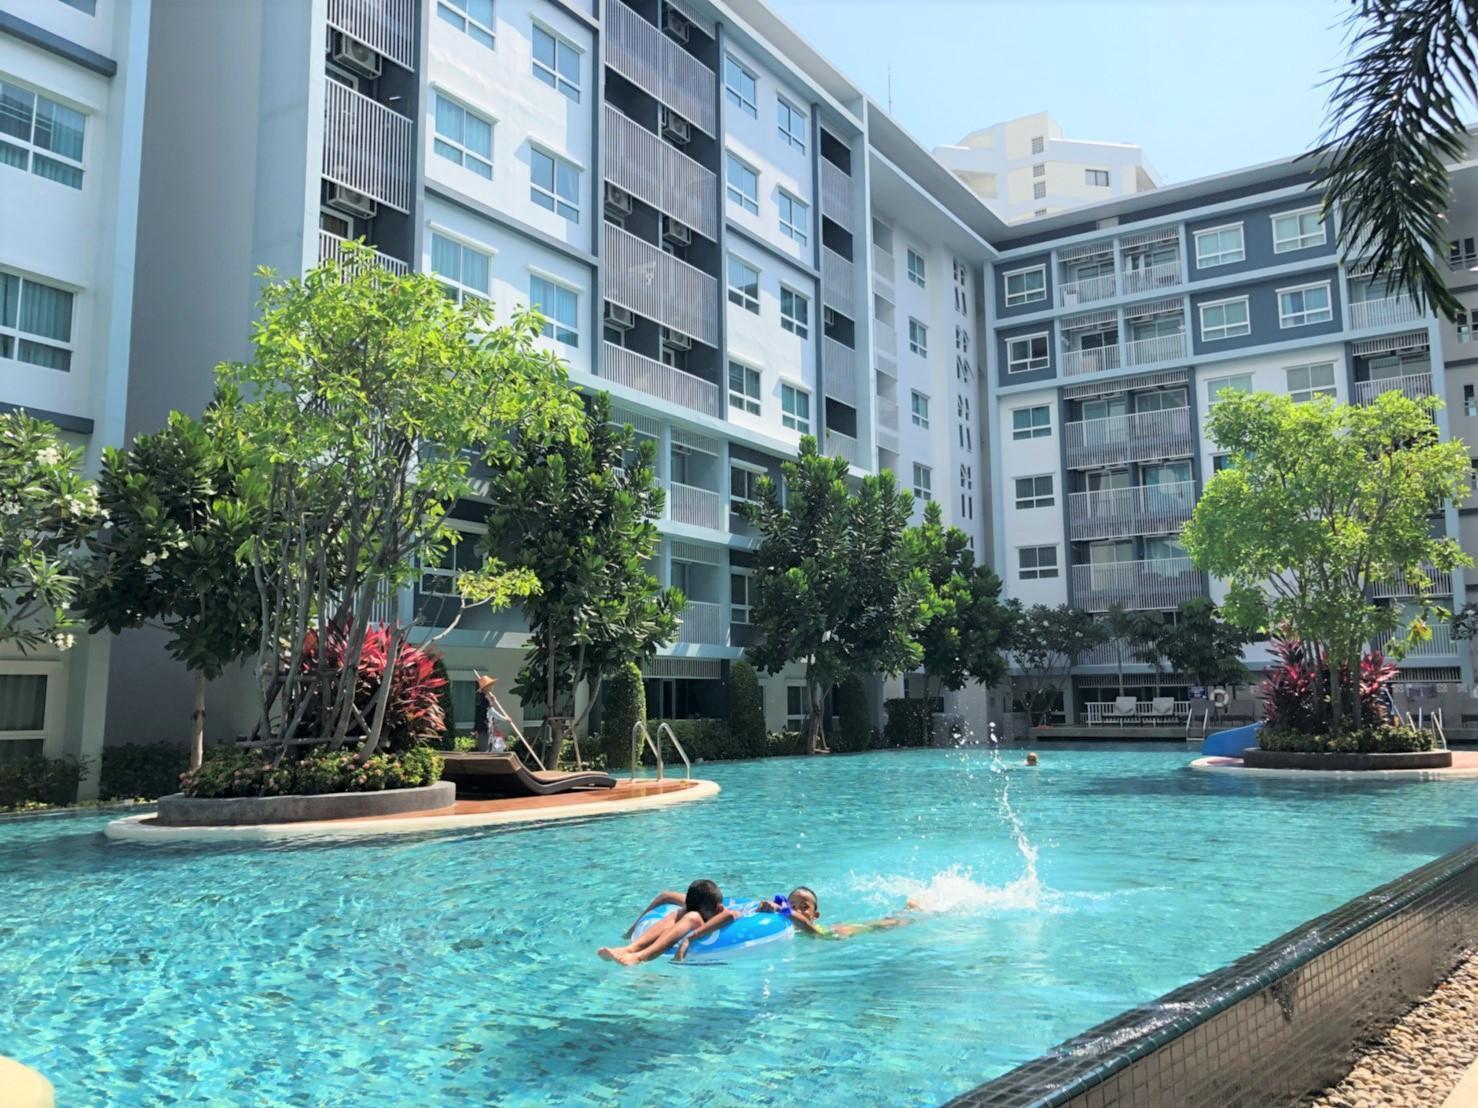 Pool View D @ The Trust Condo Hua Hin อพาร์ตเมนต์ 1 ห้องนอน 1 ห้องน้ำส่วนตัว ขนาด 33 ตร.ม. – กลางเมืองหัวหิน